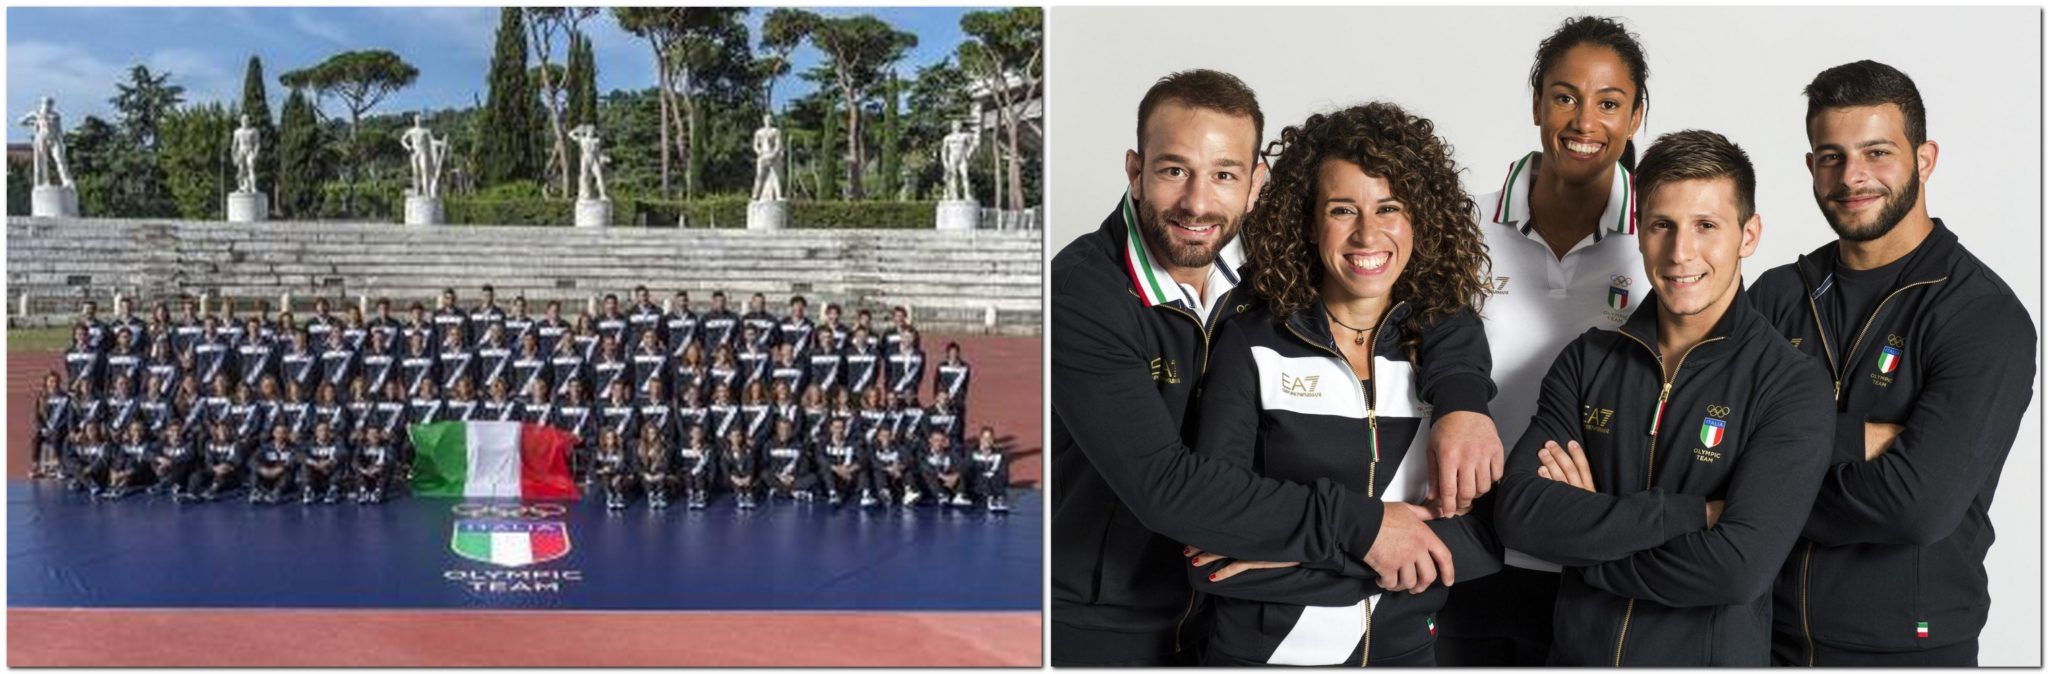 Italian Olympic Team